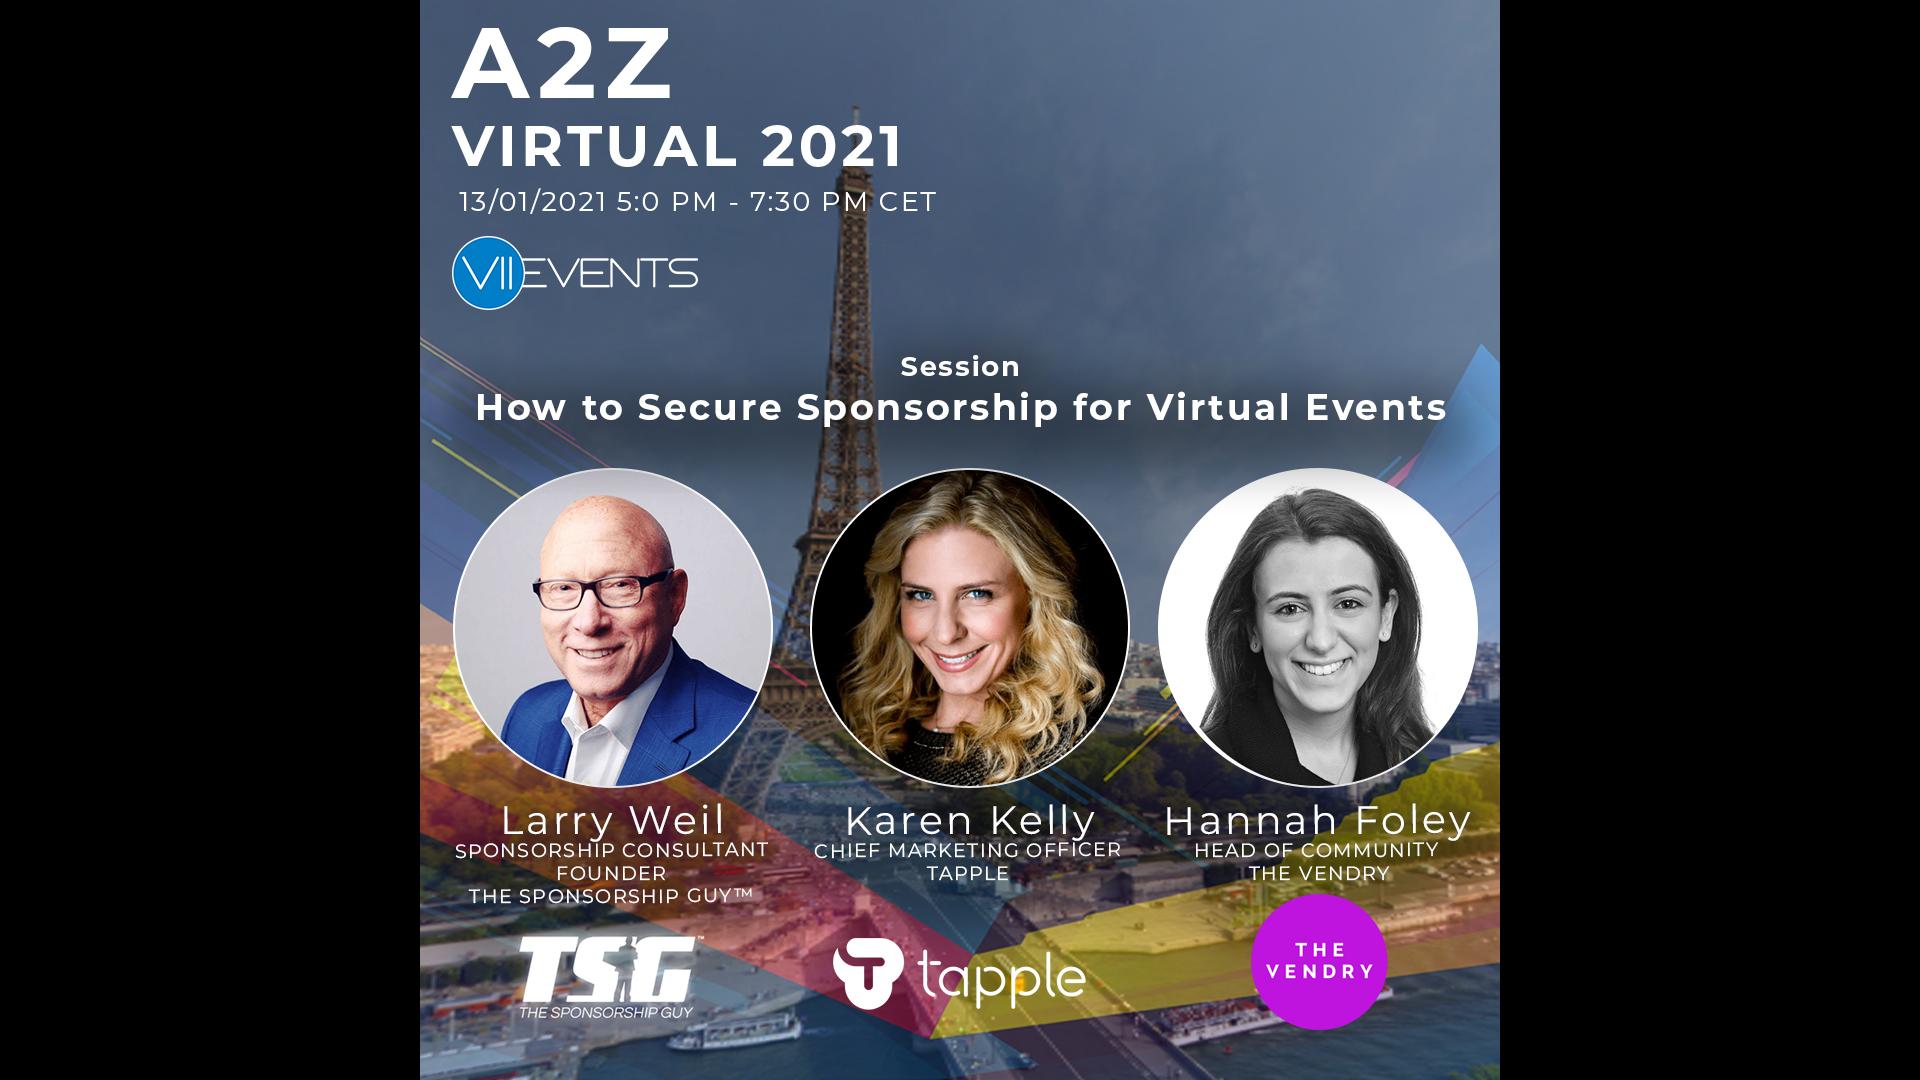 A2Z Virtual 2021 Event Profs Virtual Event